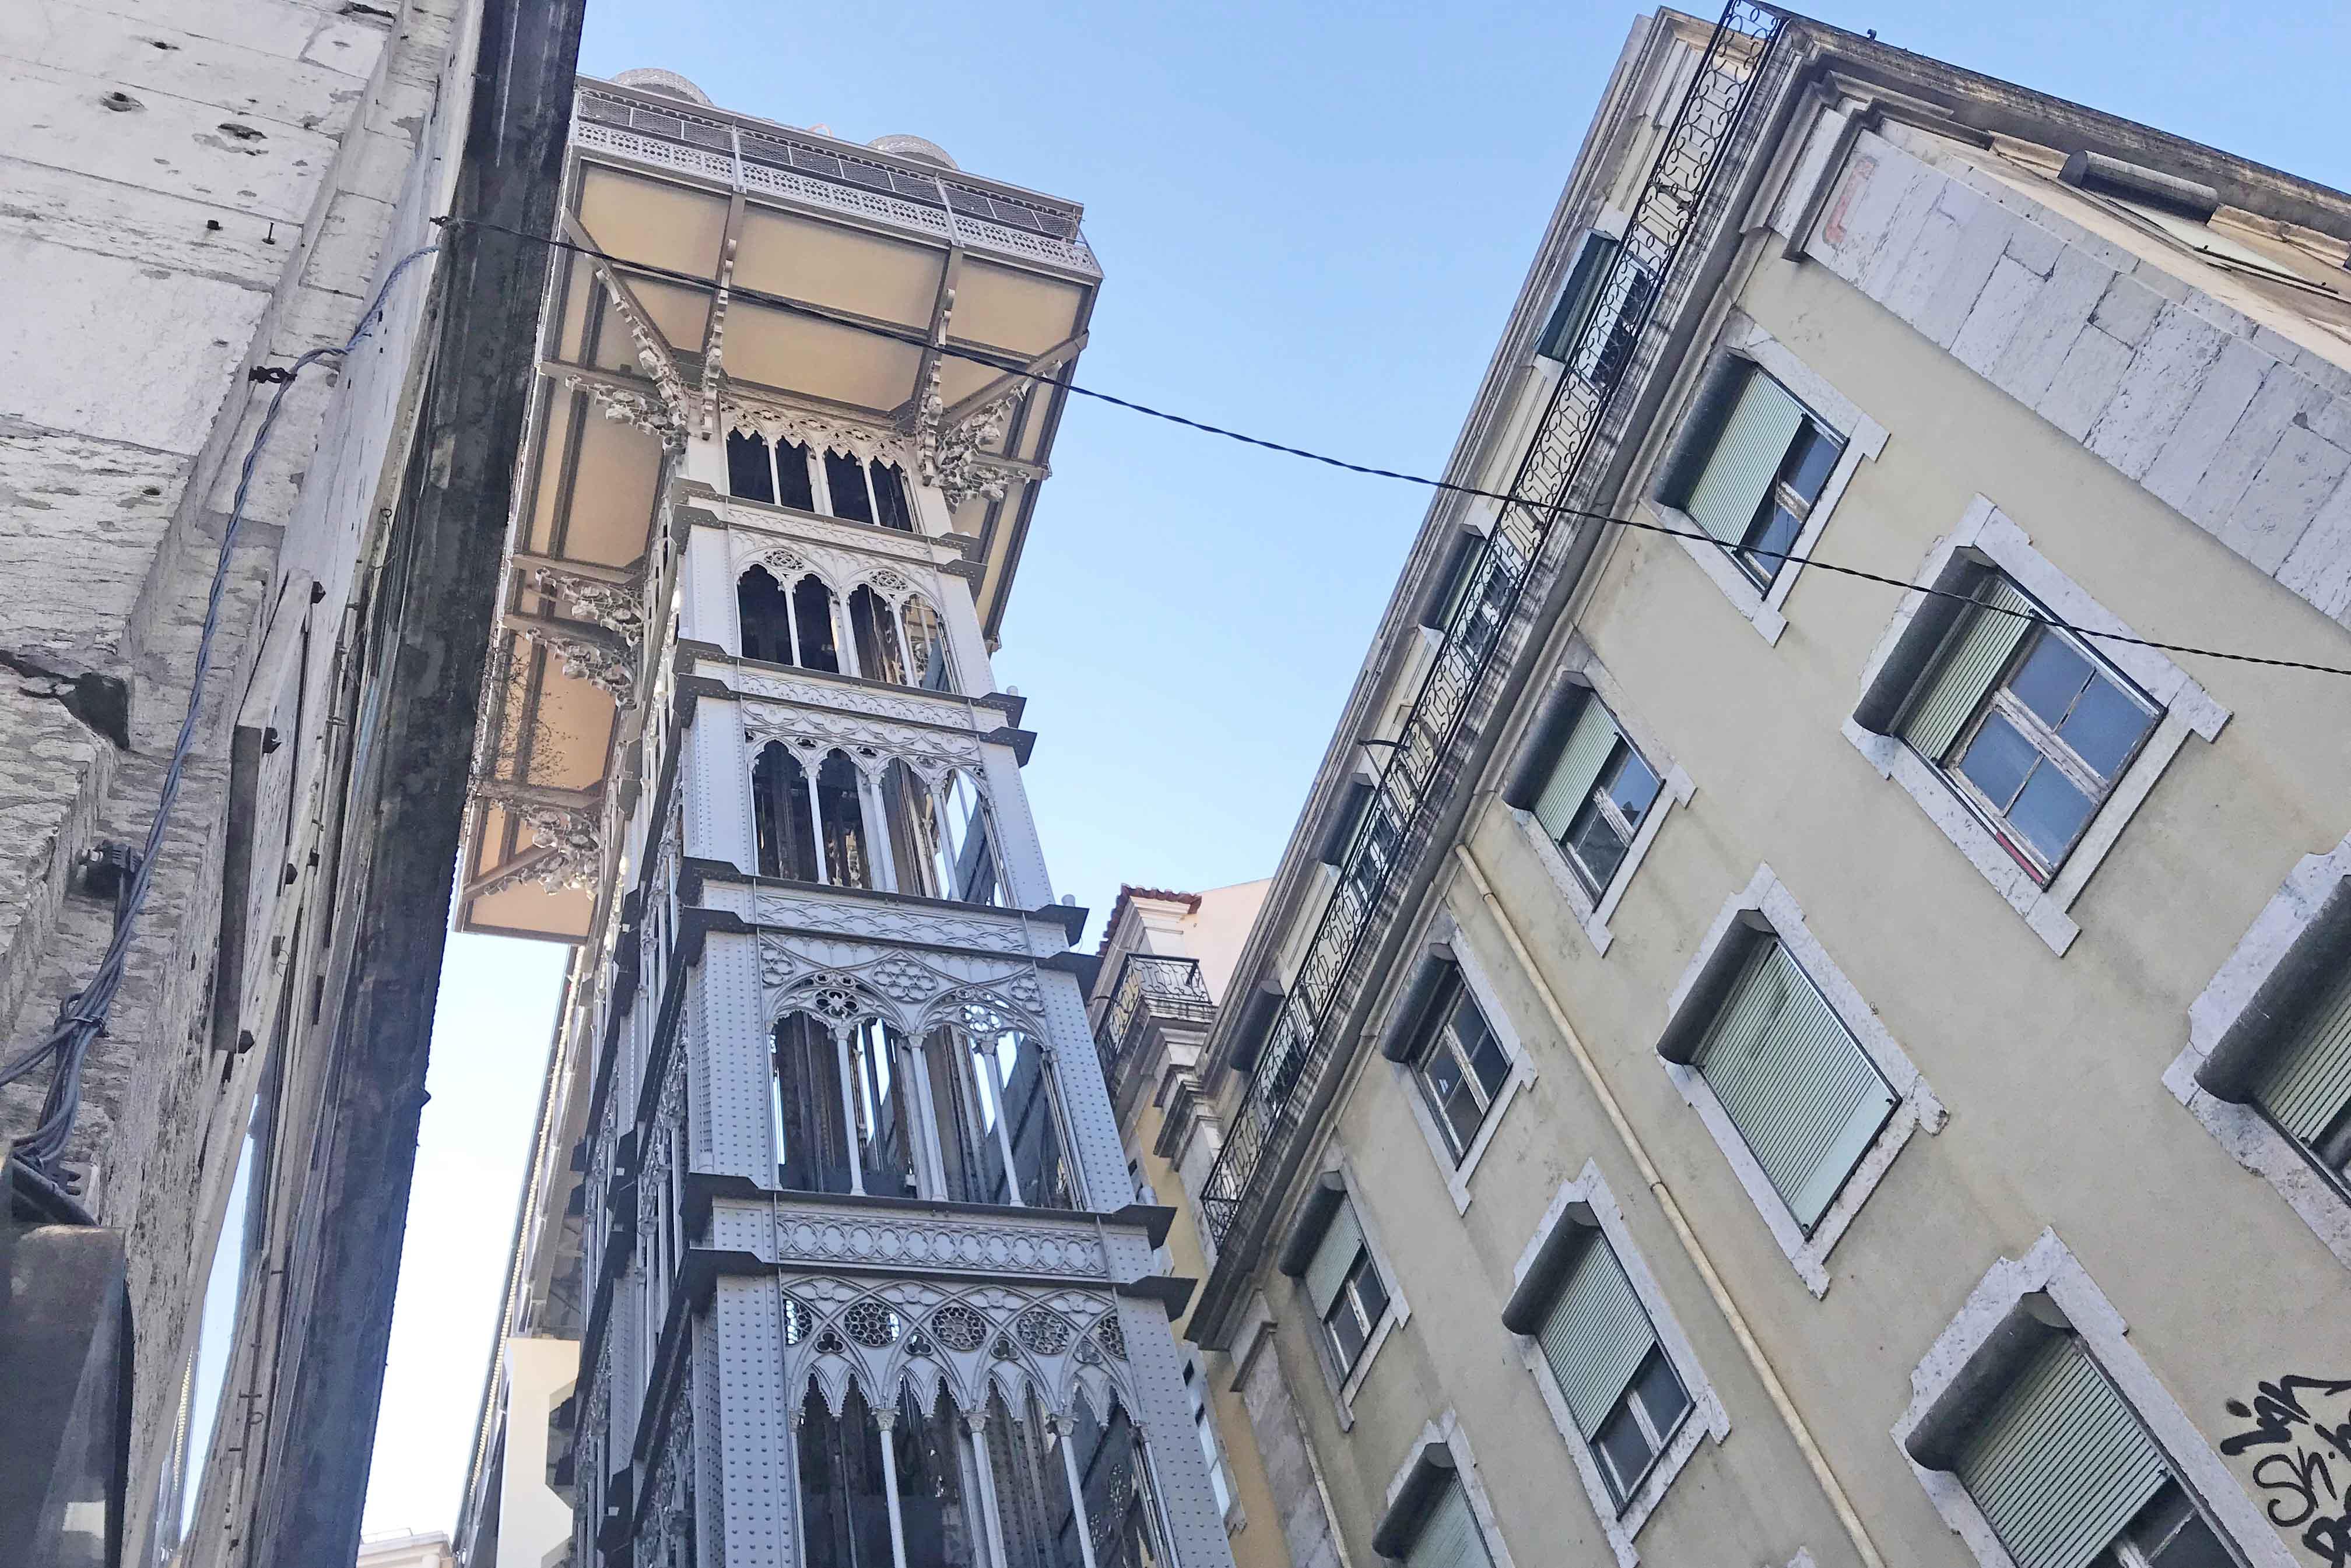 dicas de portugal - Elevador de Santa Justa - Lisboa